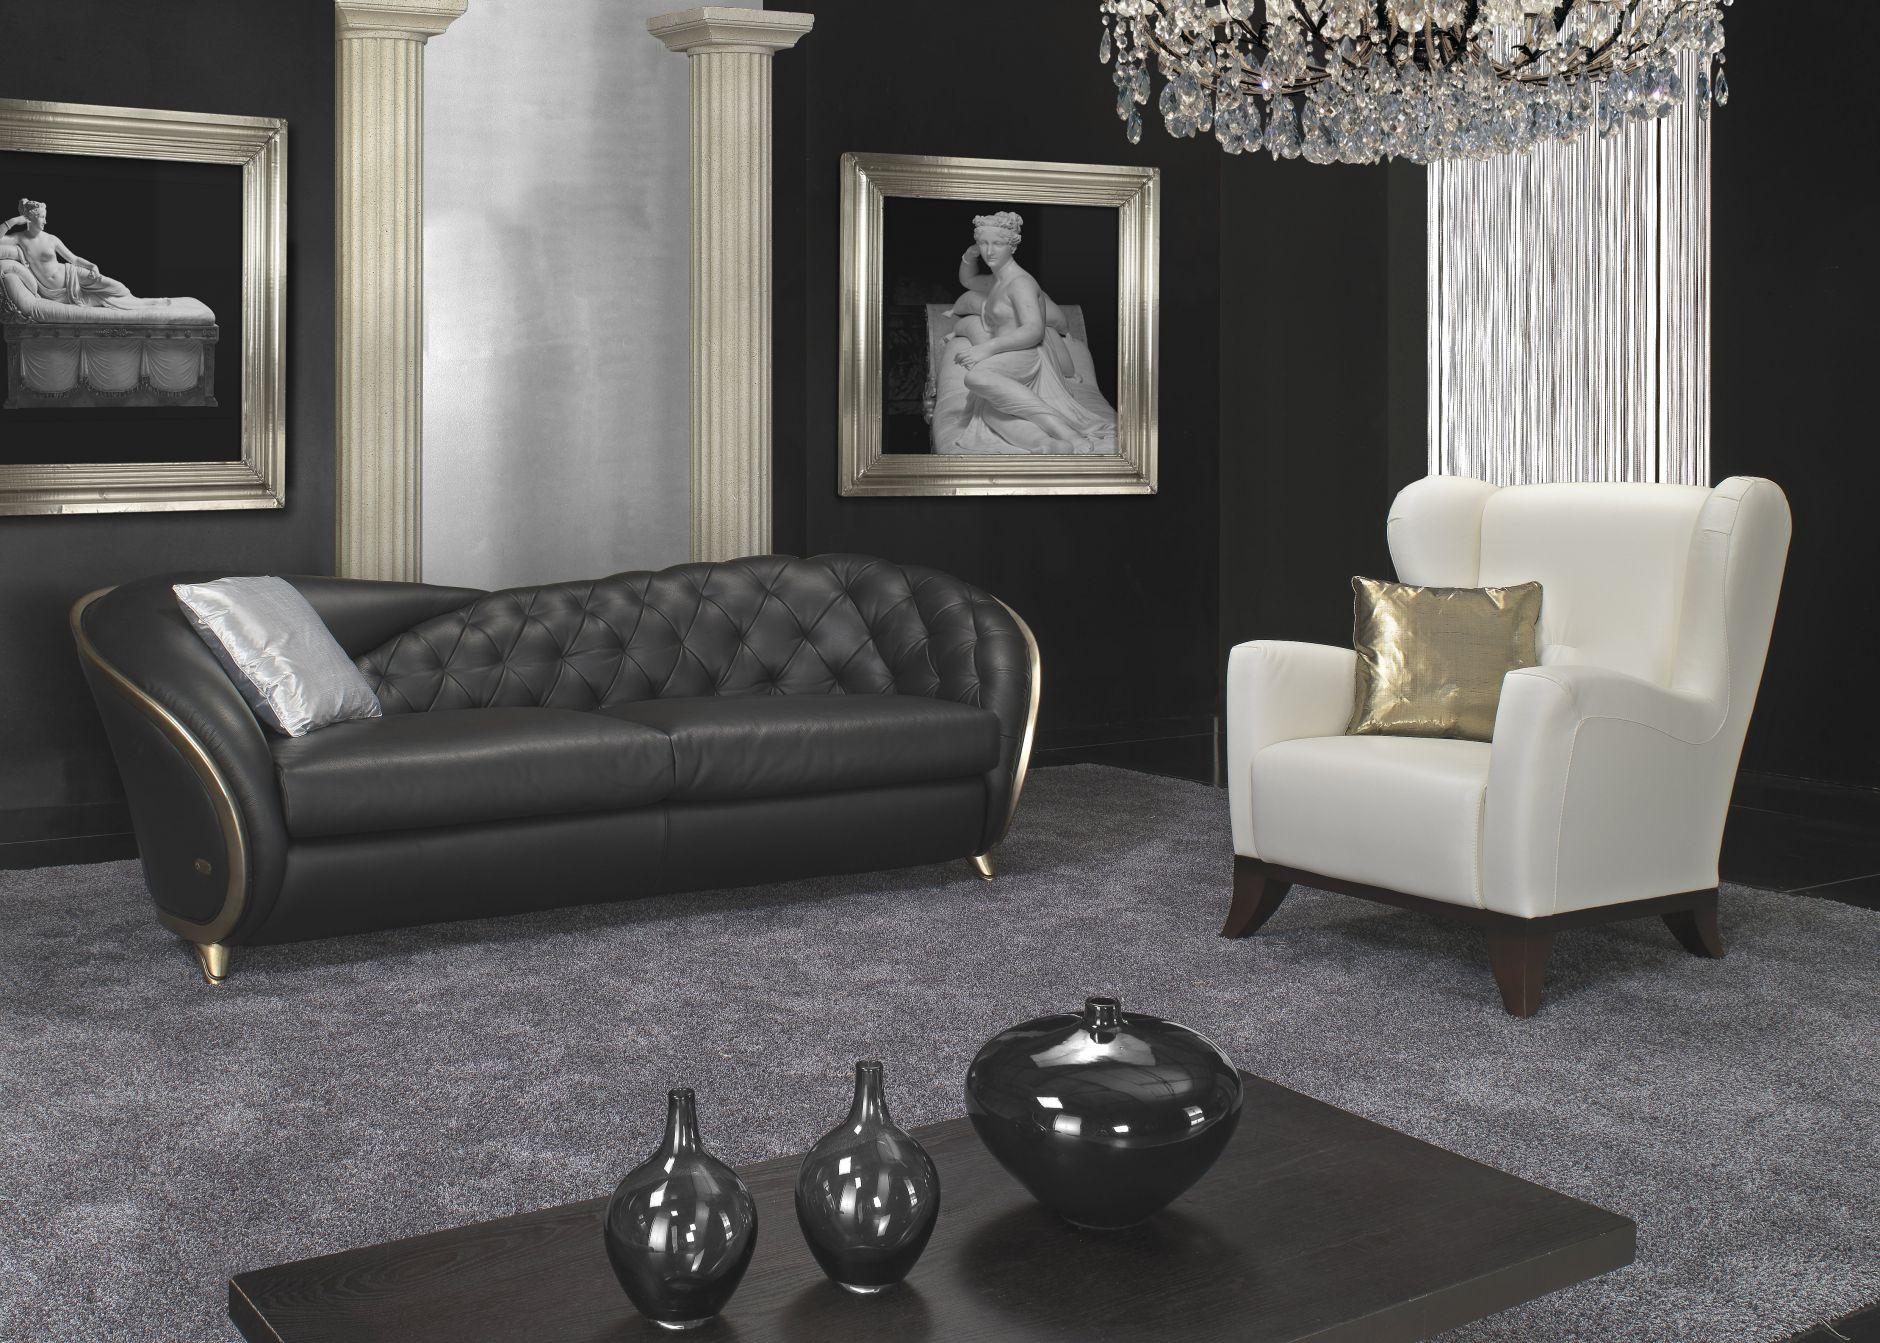 VIP-sofas - Nieri Divani Möbel Modell RomeoDie Möbel aus Italien